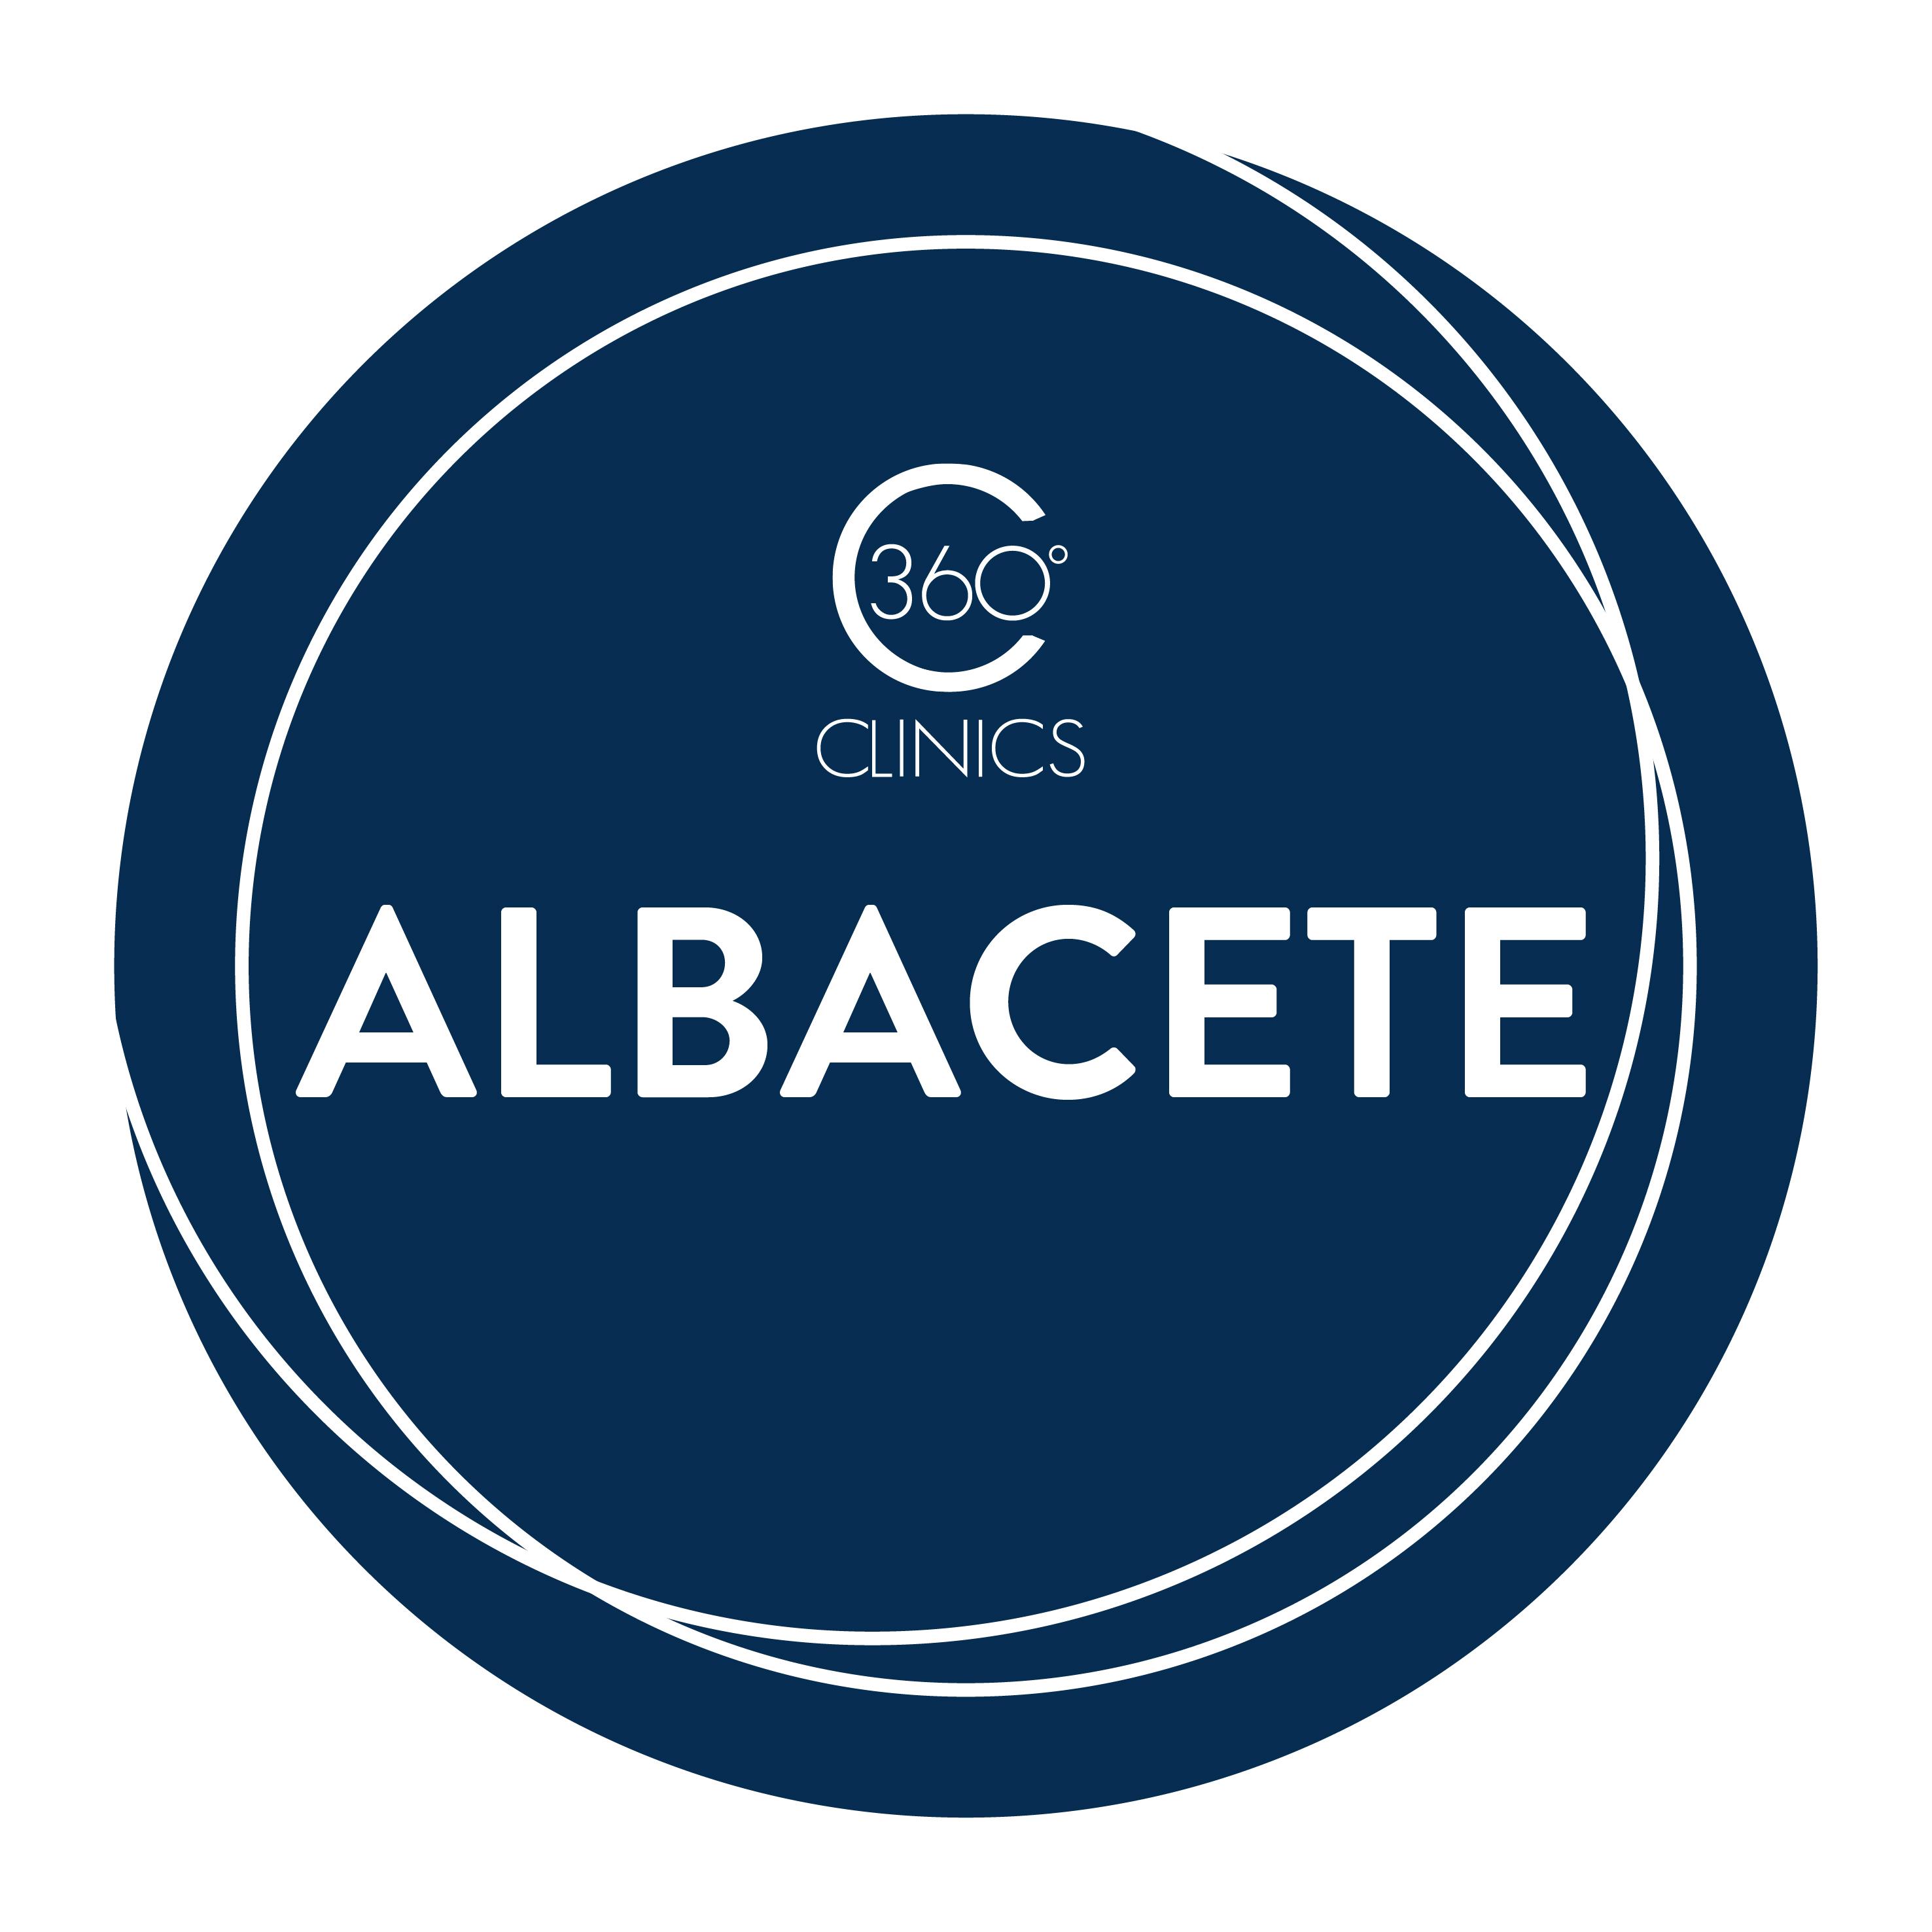 Centros de depilación láser Albacete